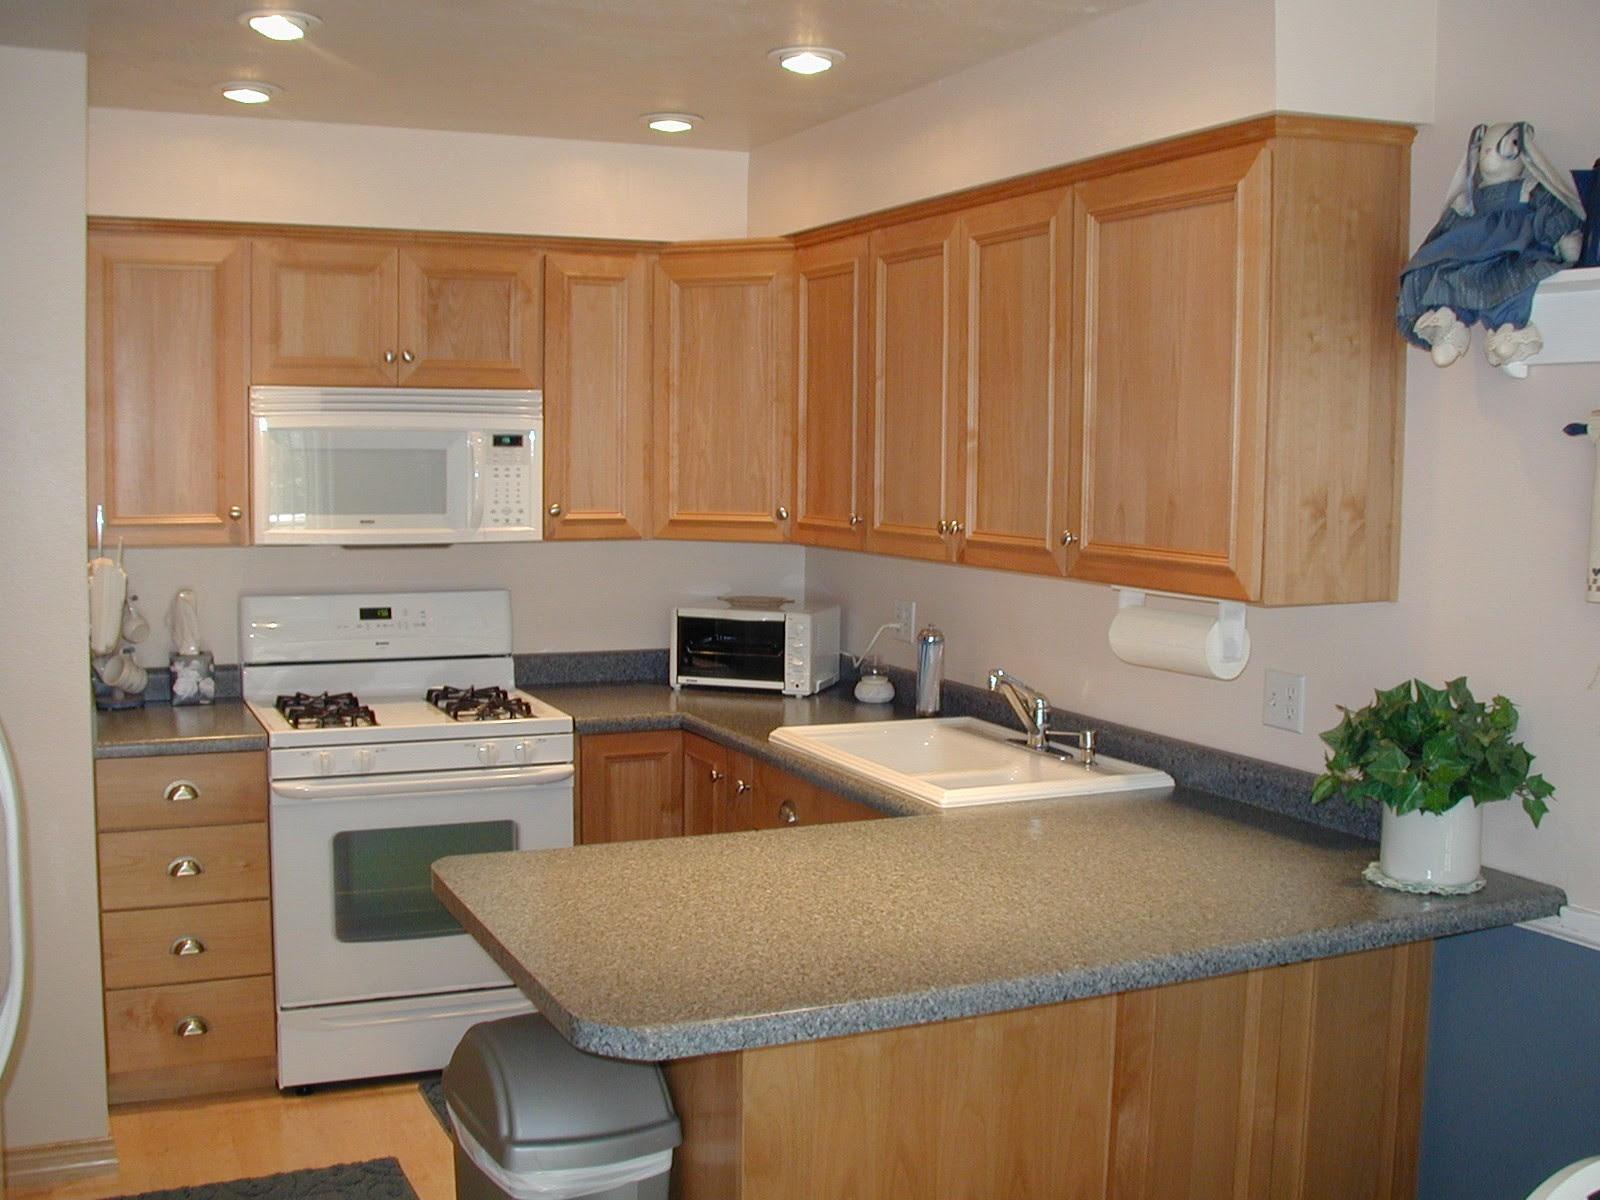 6149d1186530586 stainless vs white appliances kitchen 1